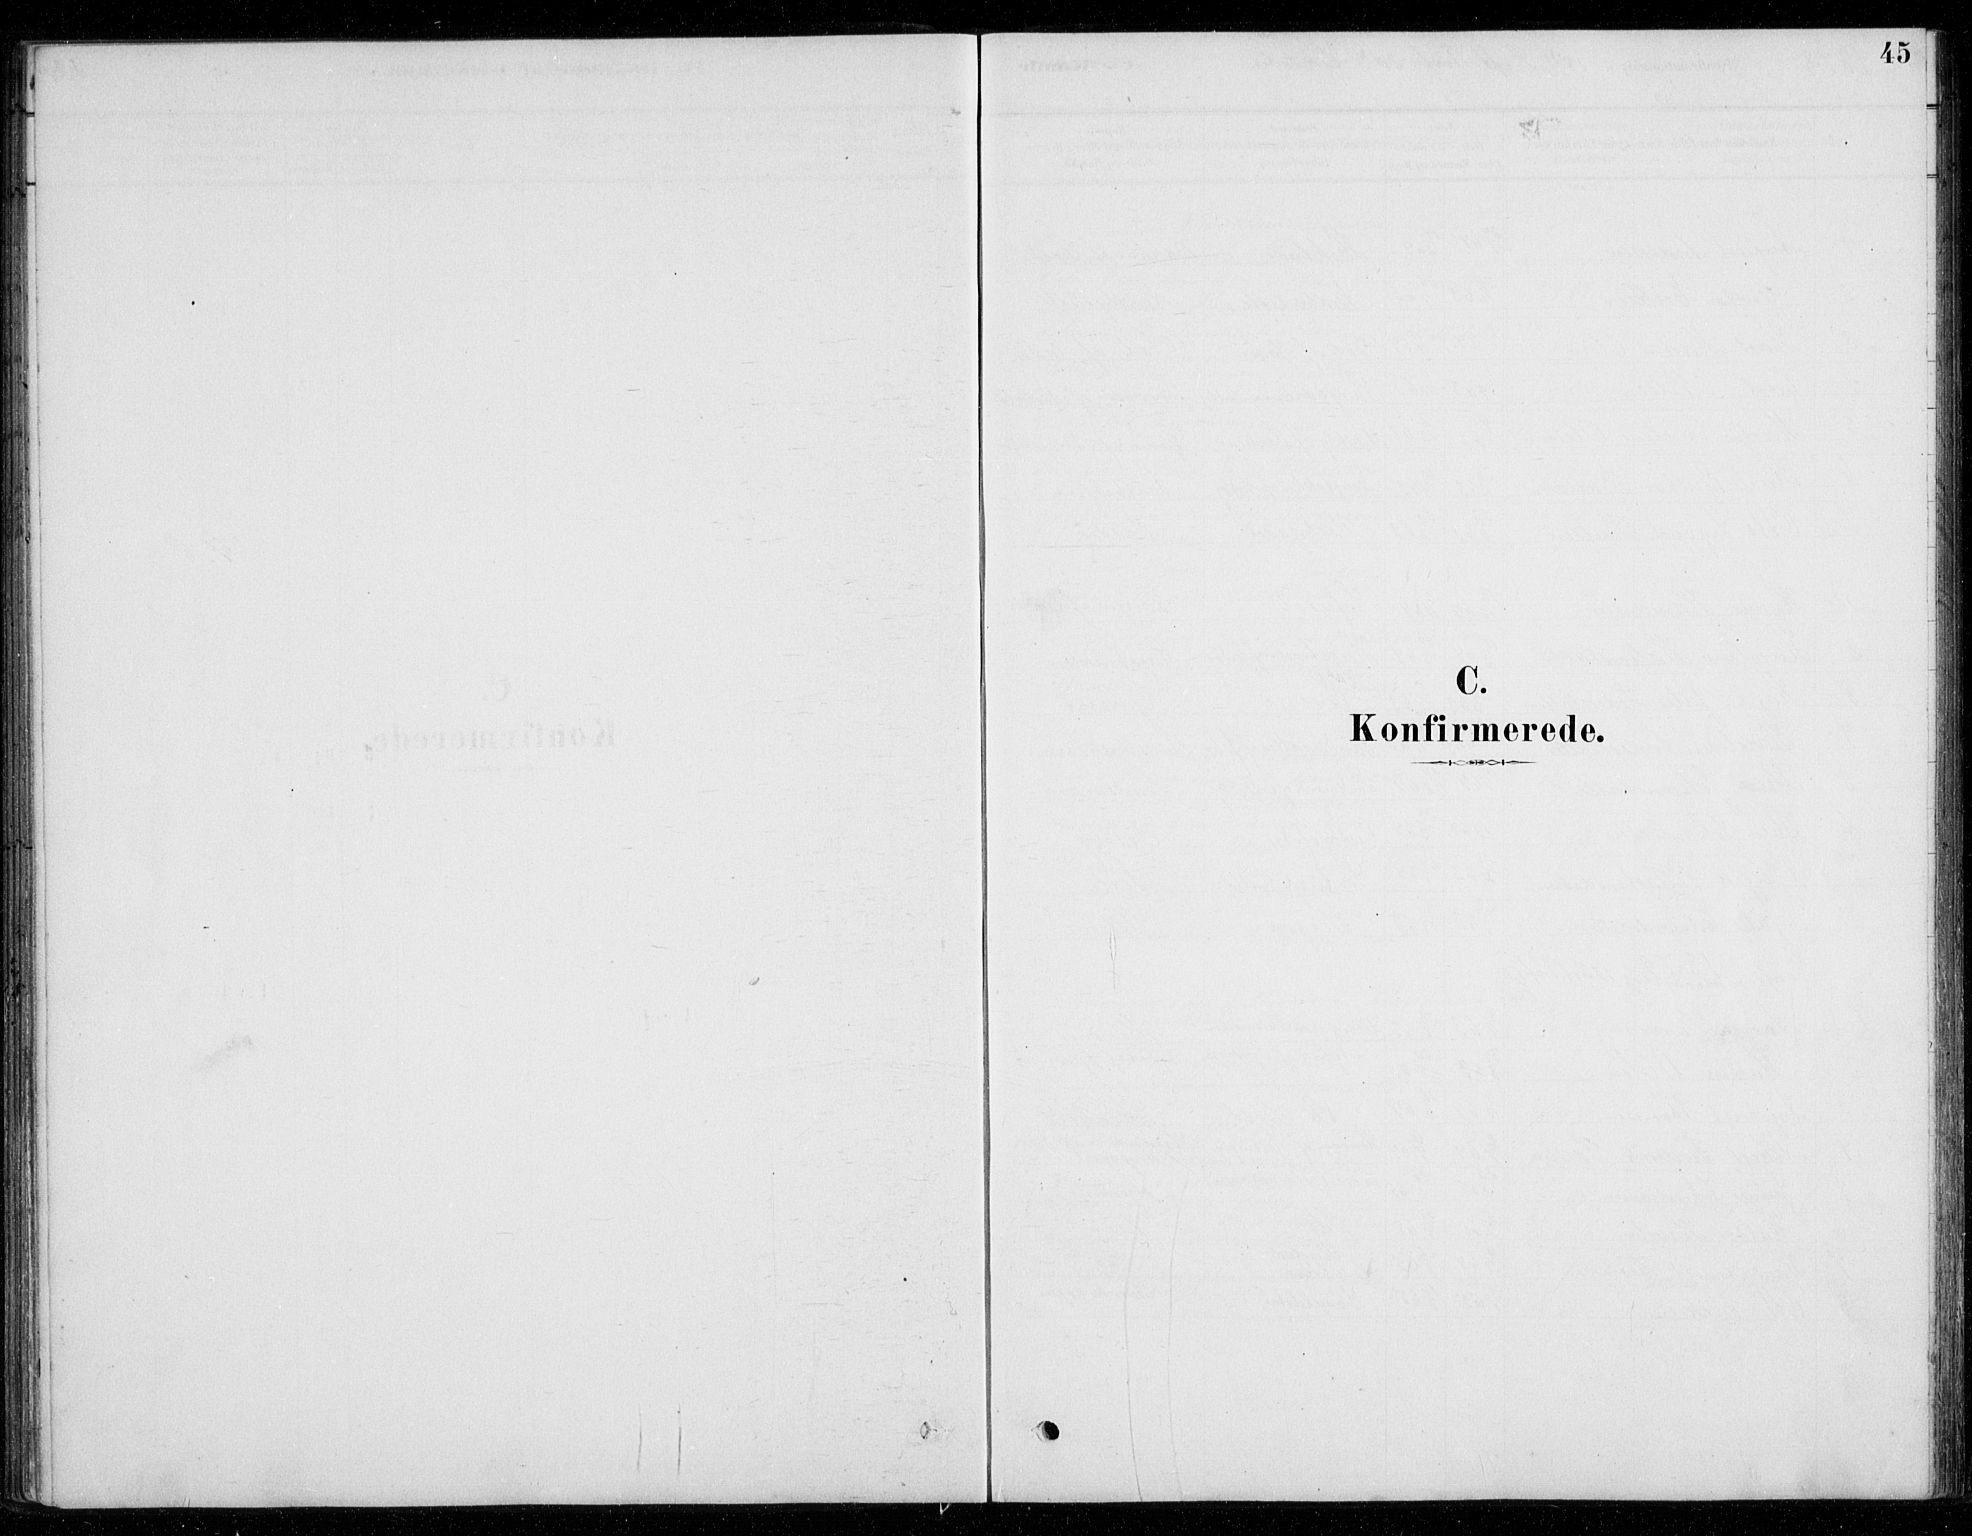 SAO, Fet prestekontor Kirkebøker, G/Gb/L0002: Klokkerbok nr. II 2, 1878-1911, s. 45